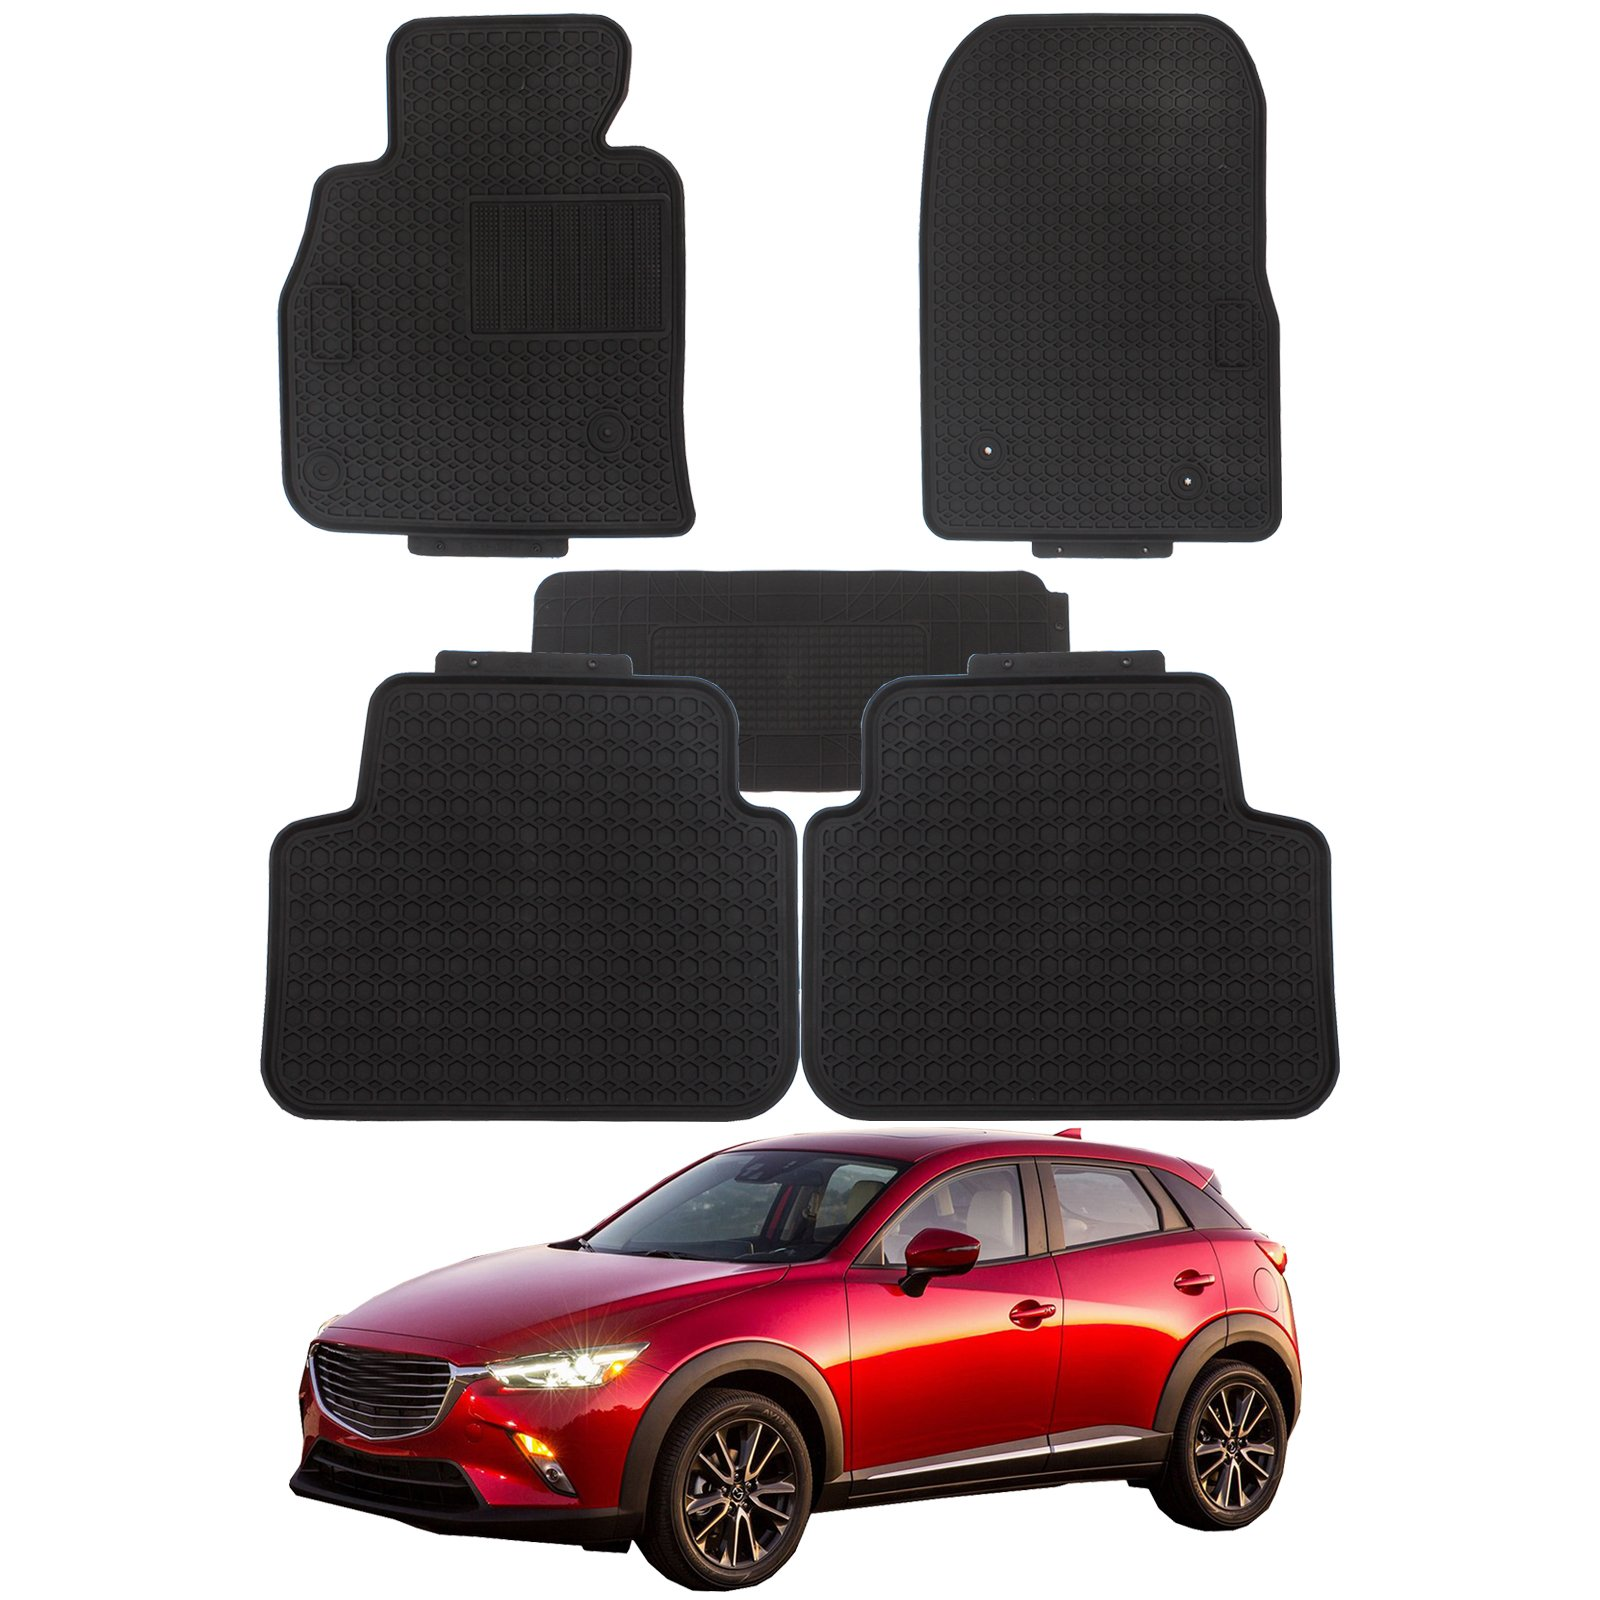 Get Quotations · Mazda 3 Floor Mats Durable Breathable Floor Liners PVC  Latex fit 2016 2017 Mazda 3 Black